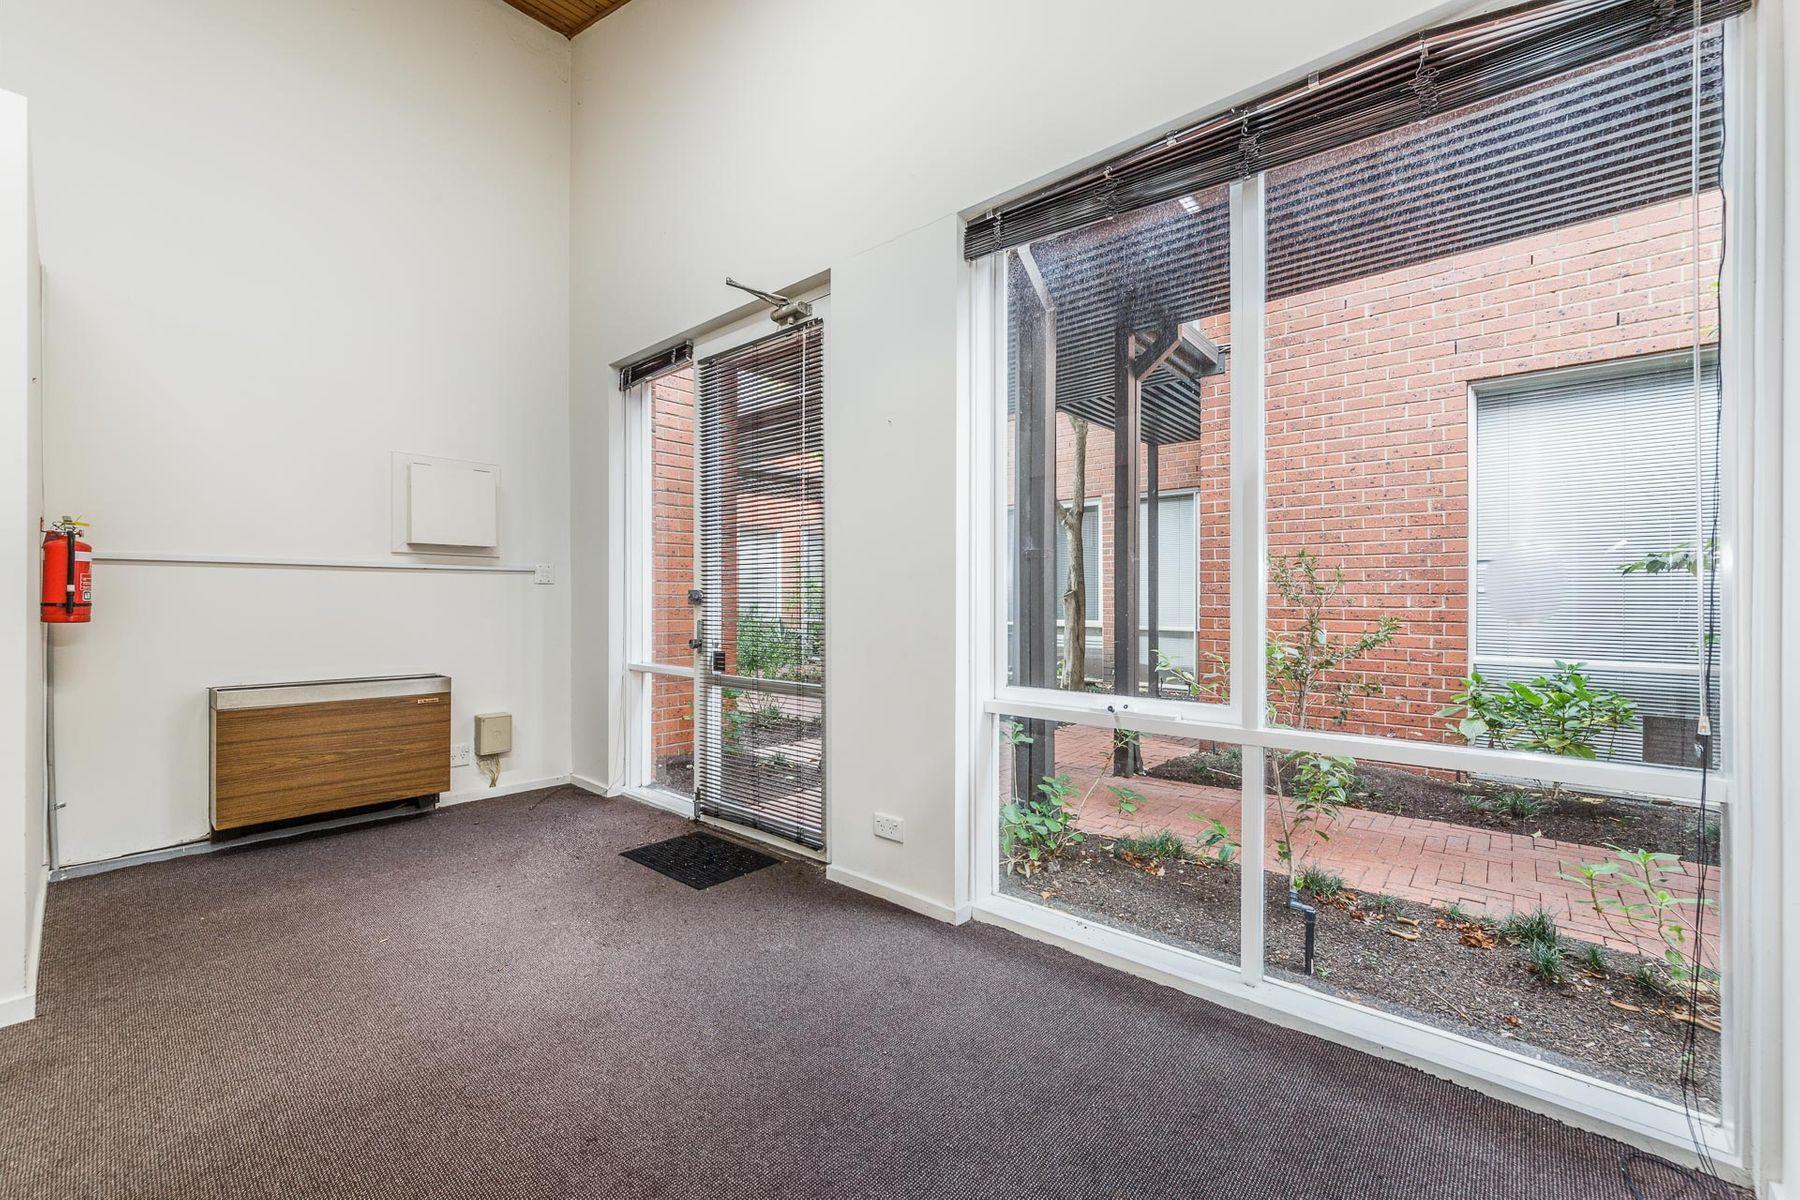 Suite 10, 118 Church St, Hawthorn